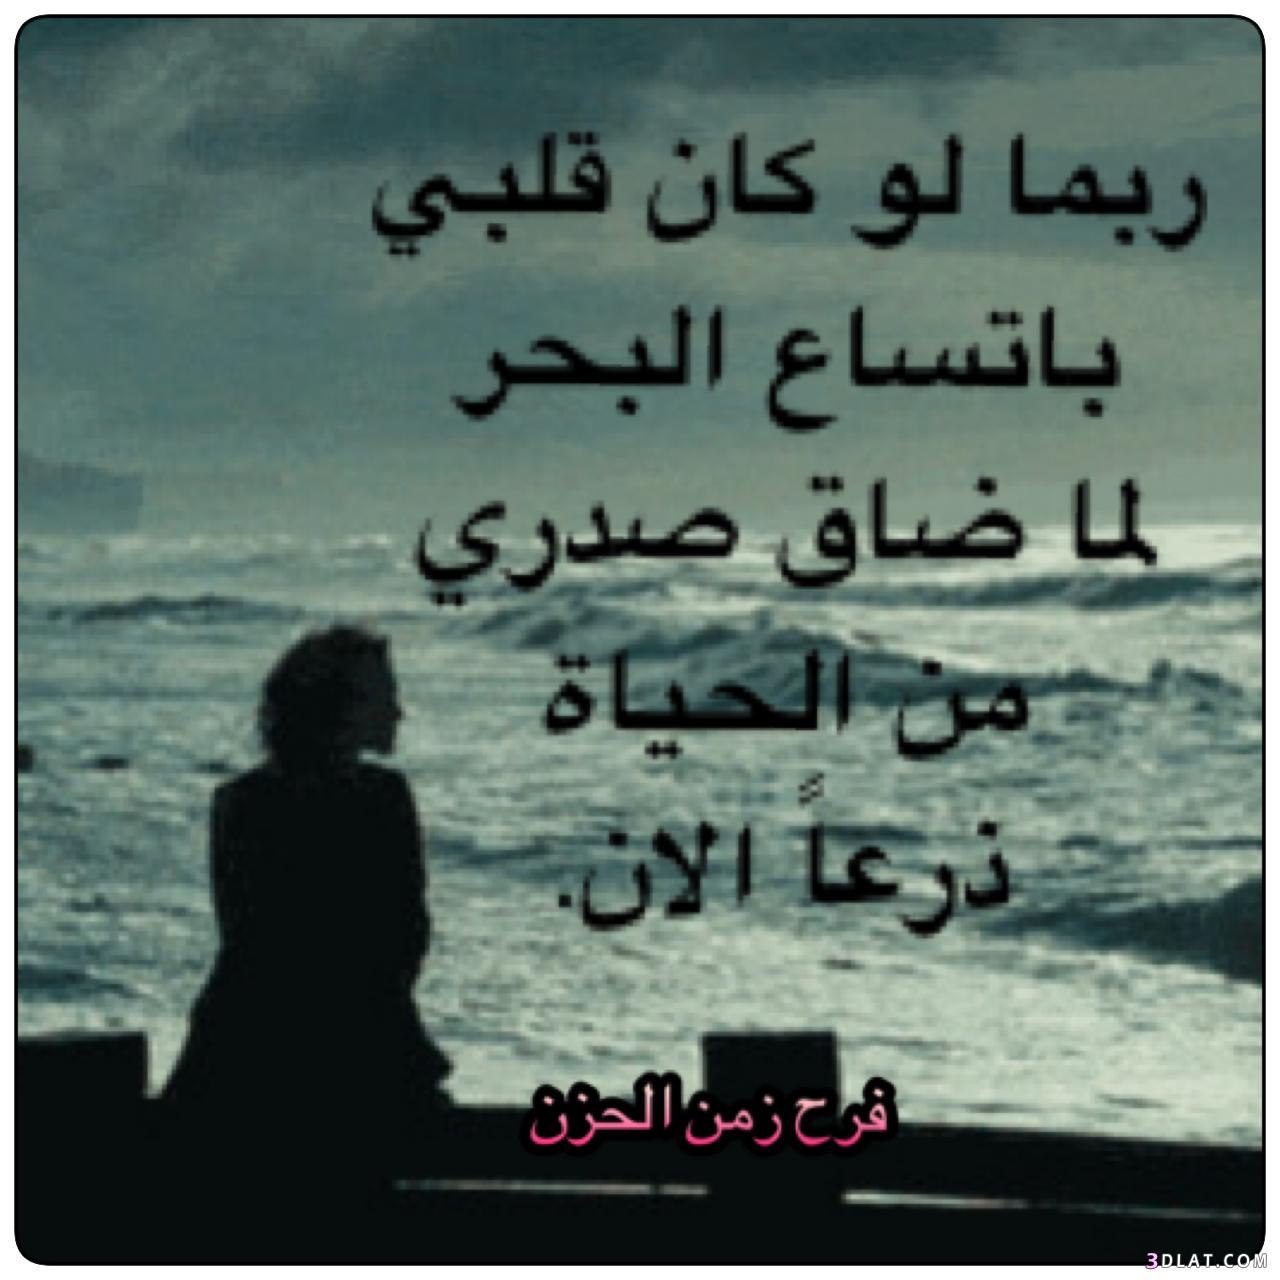 وعبارات كتابتي وتصميمي 3dlat.com_07_18_9509